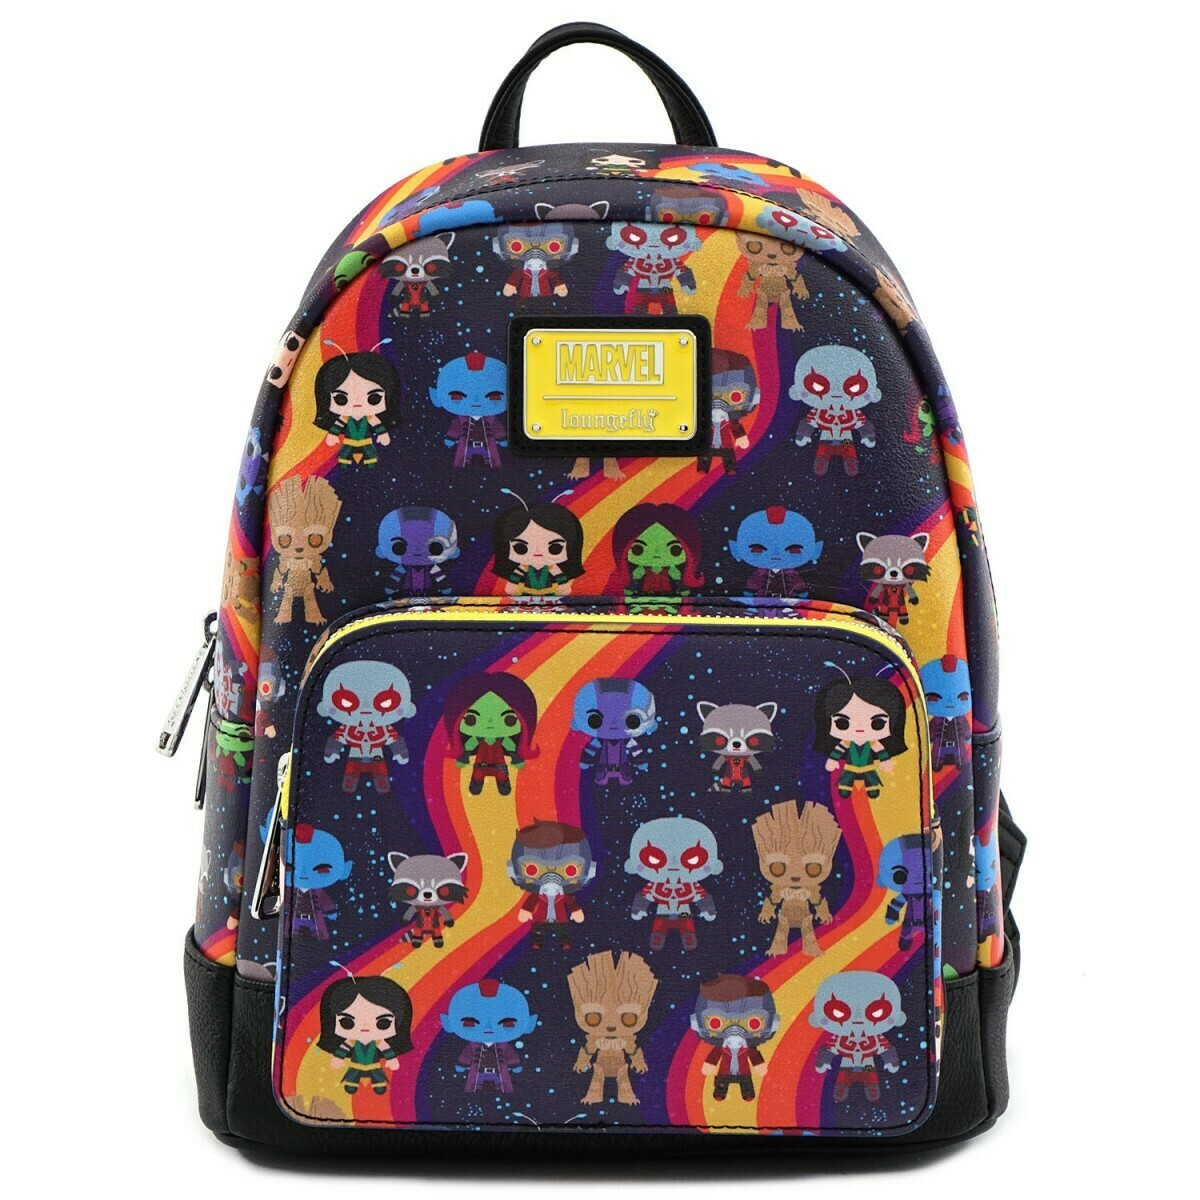 Bolsa Mochila Chibi Guardianes de la Galaxia X0